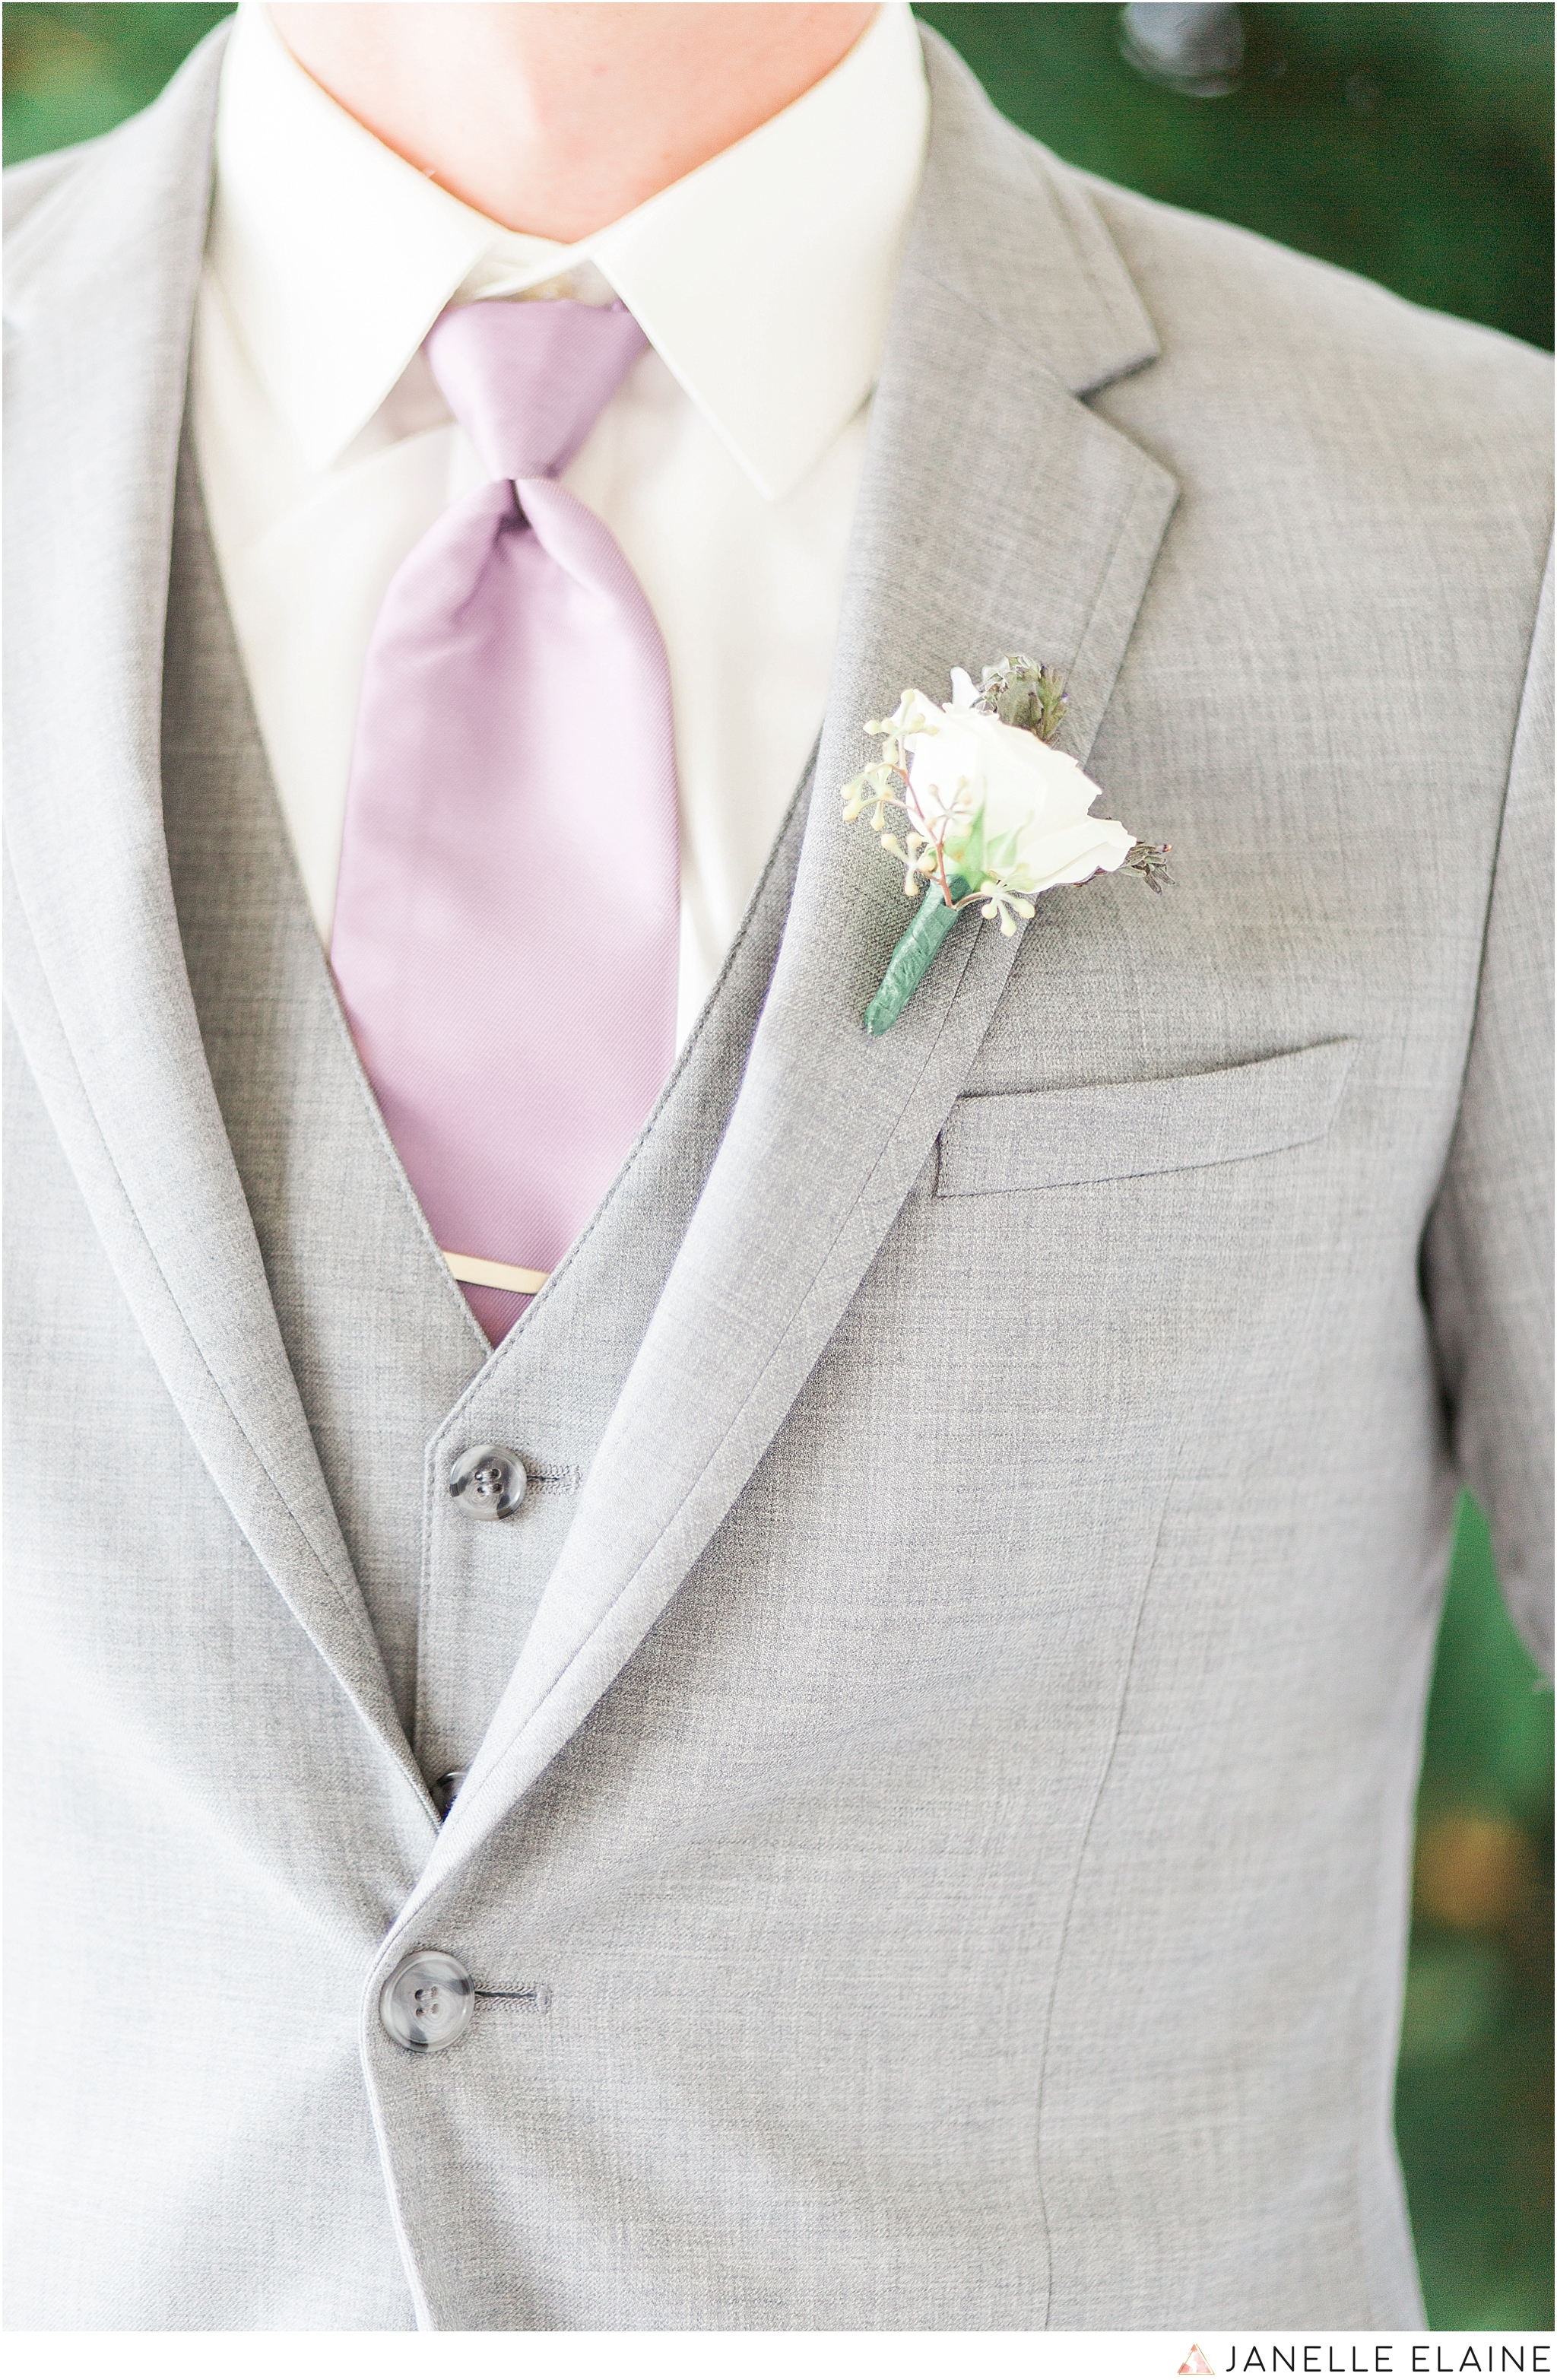 warnsholz-wedding-michigan-photography-janelle elaine photography-69.jpg